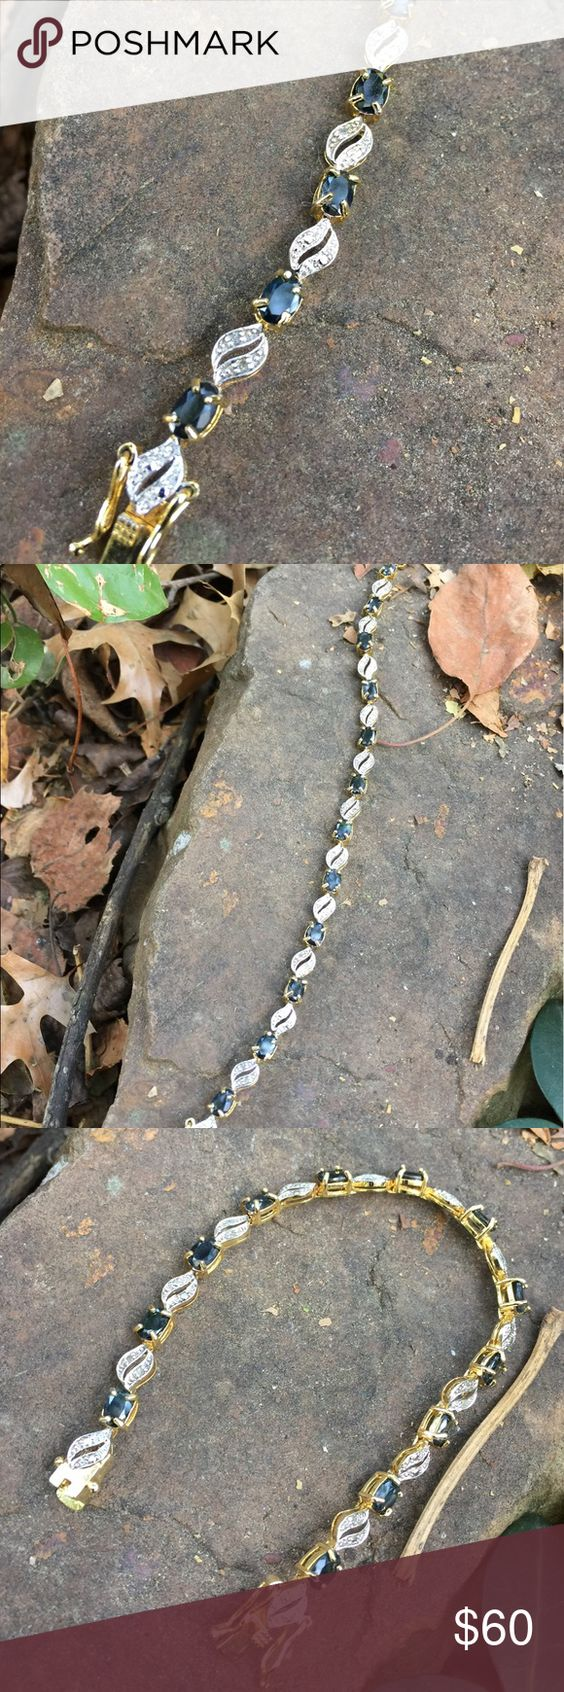 Blue sapphire bracelet nwot sterling silvergold plated sapphire